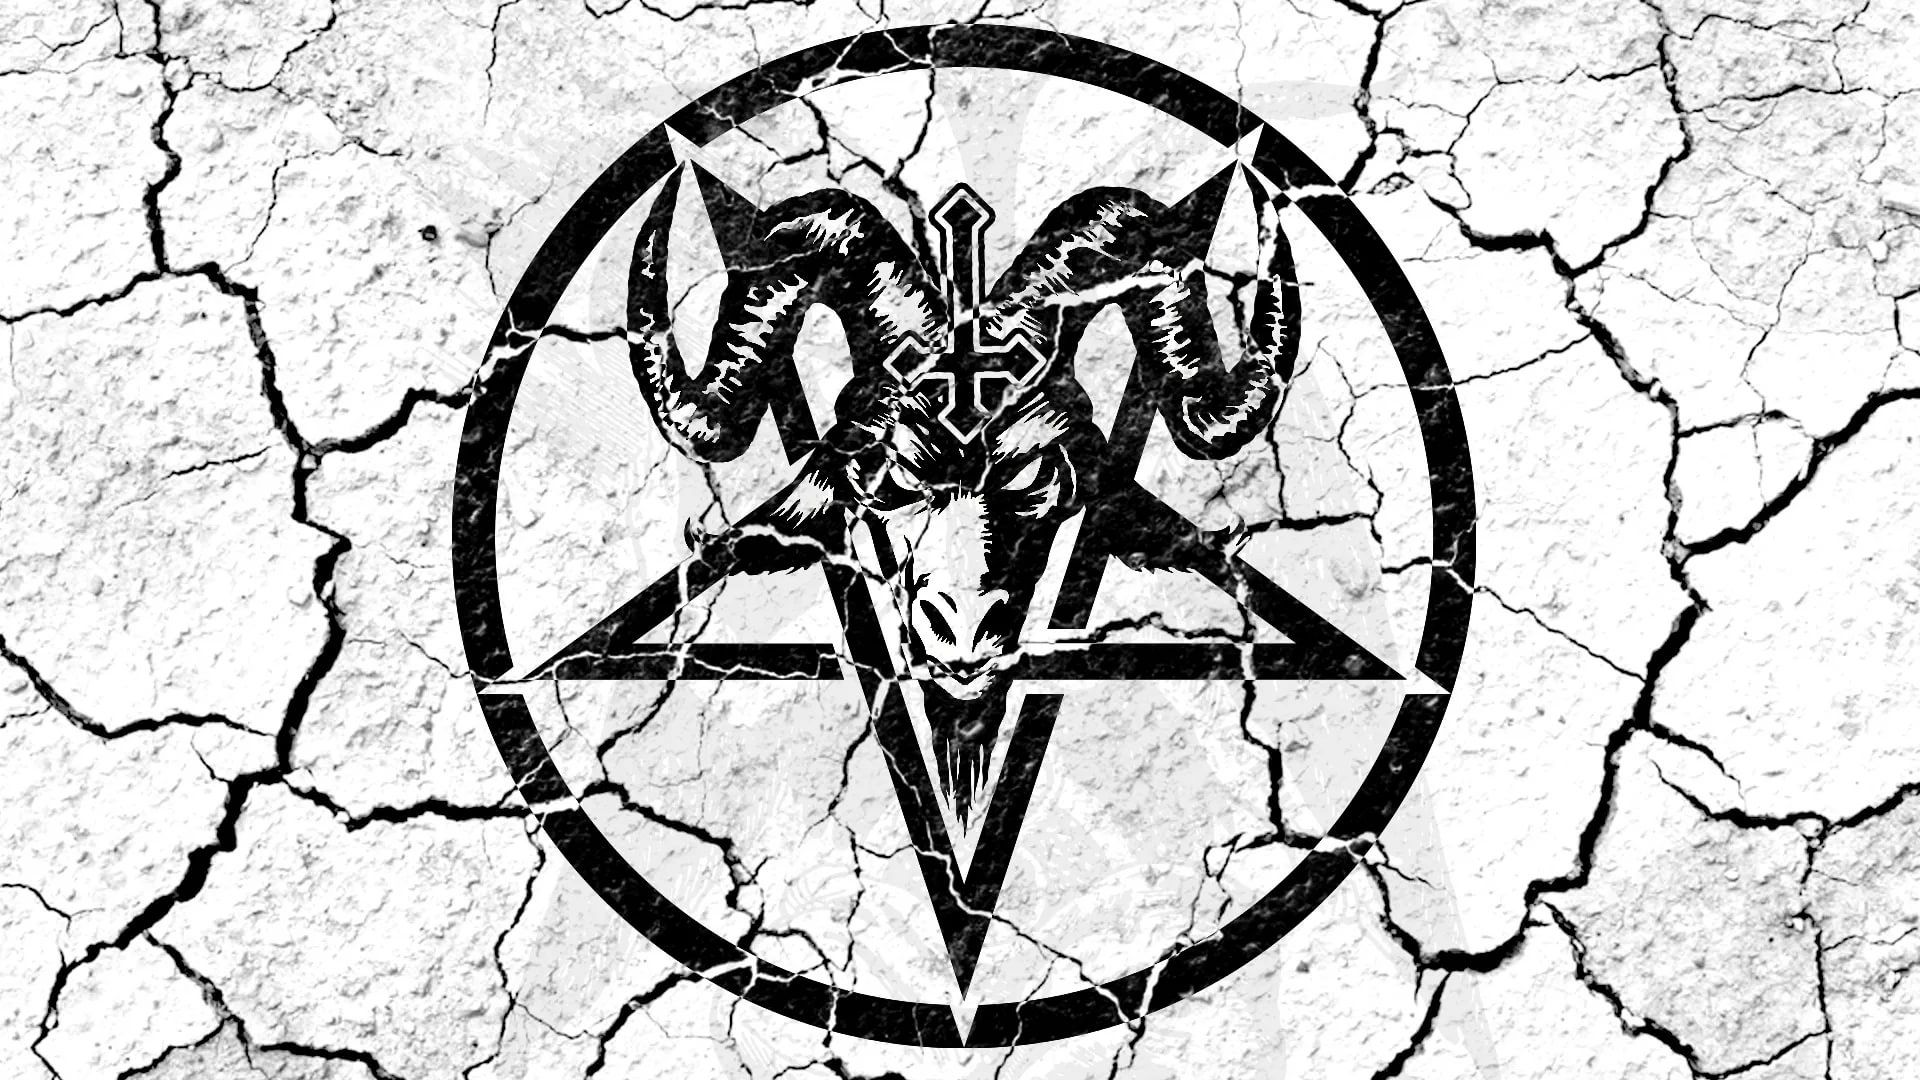 Satanic wallpaper image